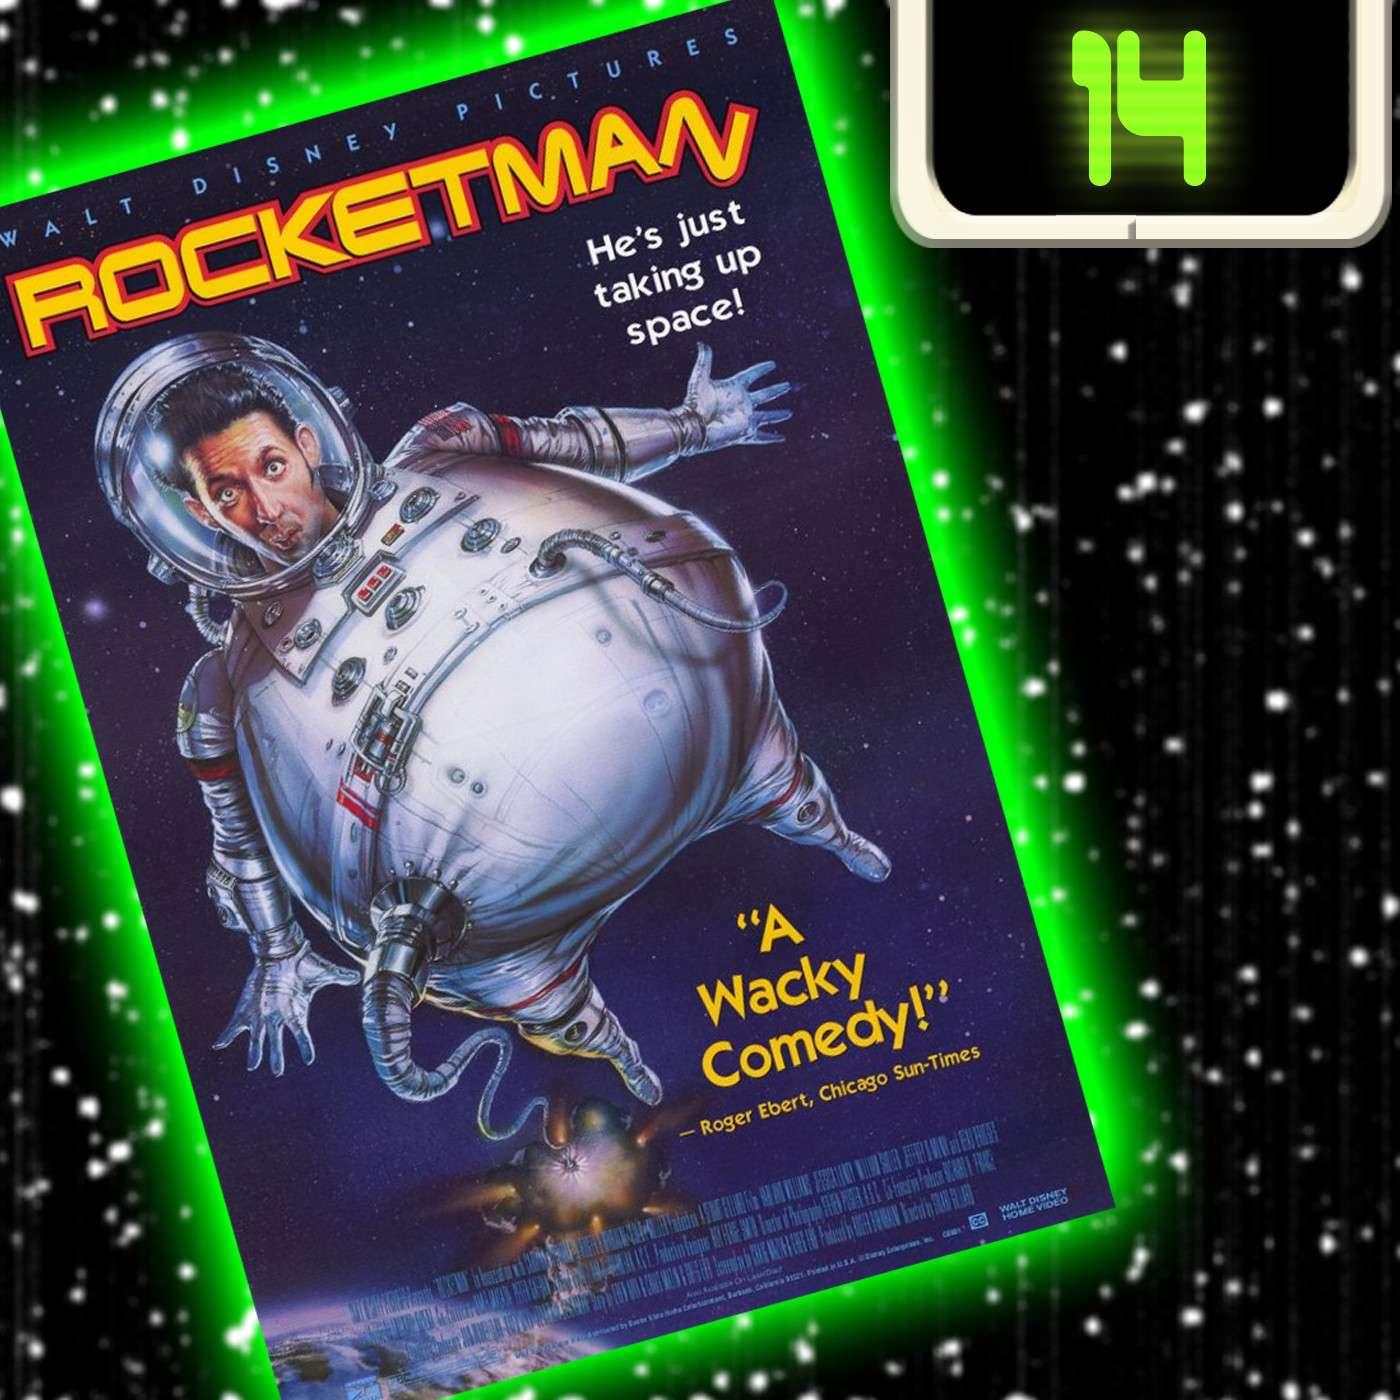 Test Subject #14: RocketMan (1997)